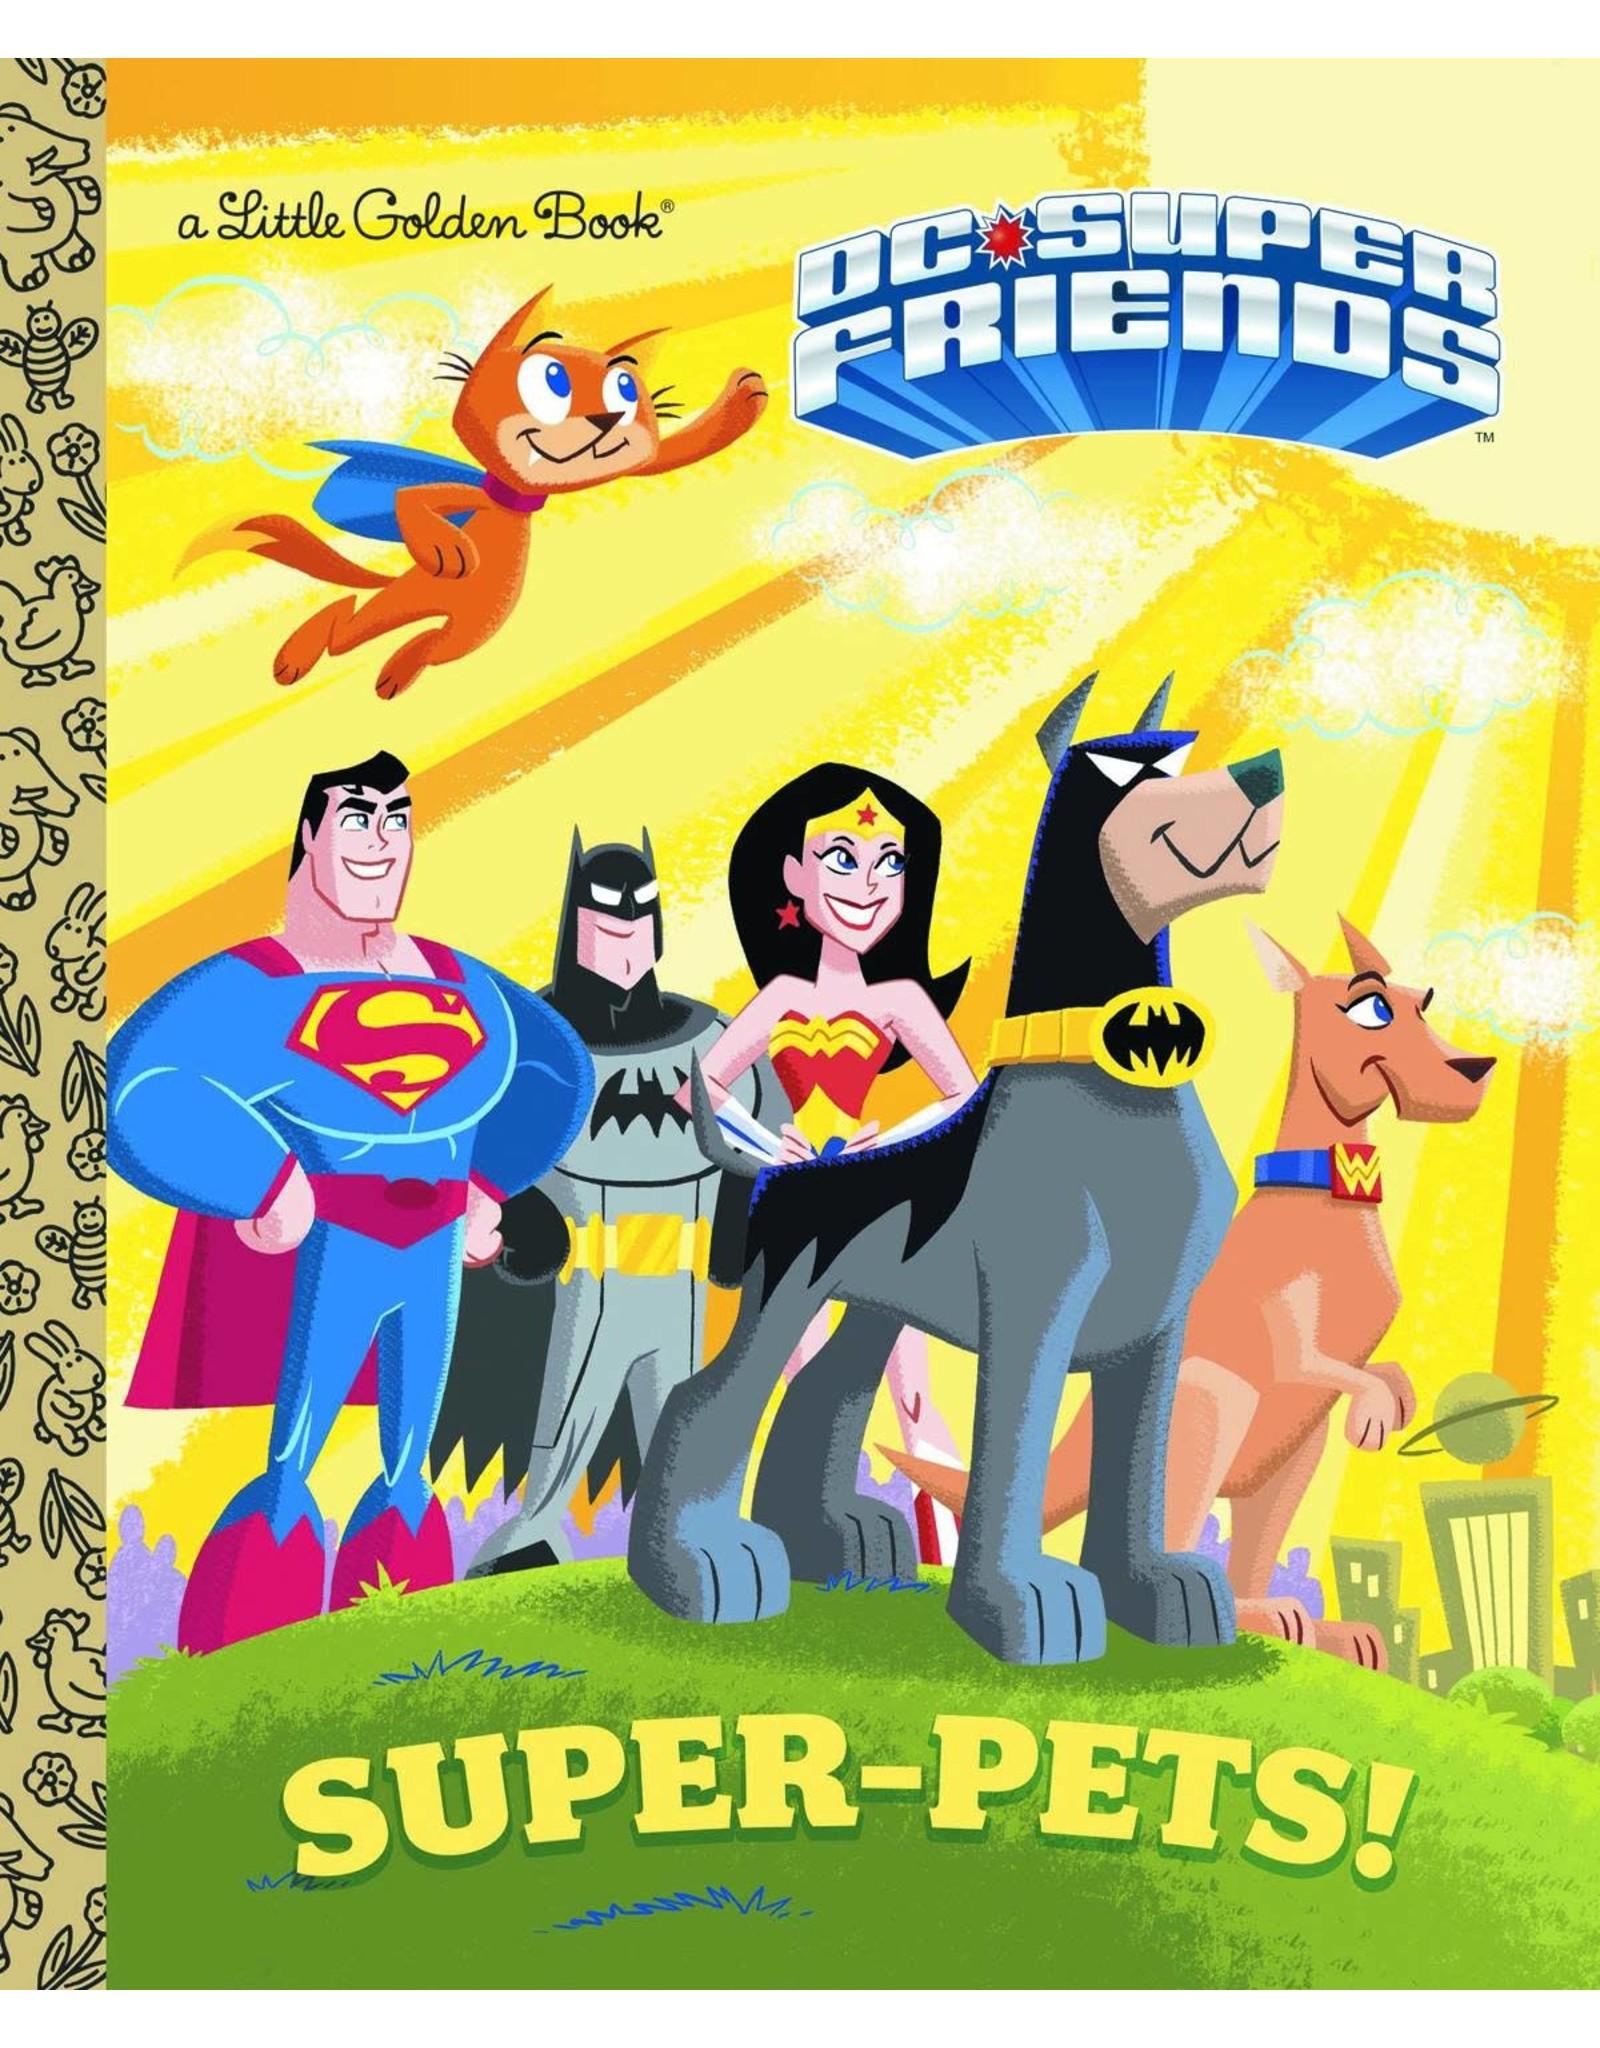 DC SUPER FRIENDS SUPER PETS LITTLE GOLDEN BOOK